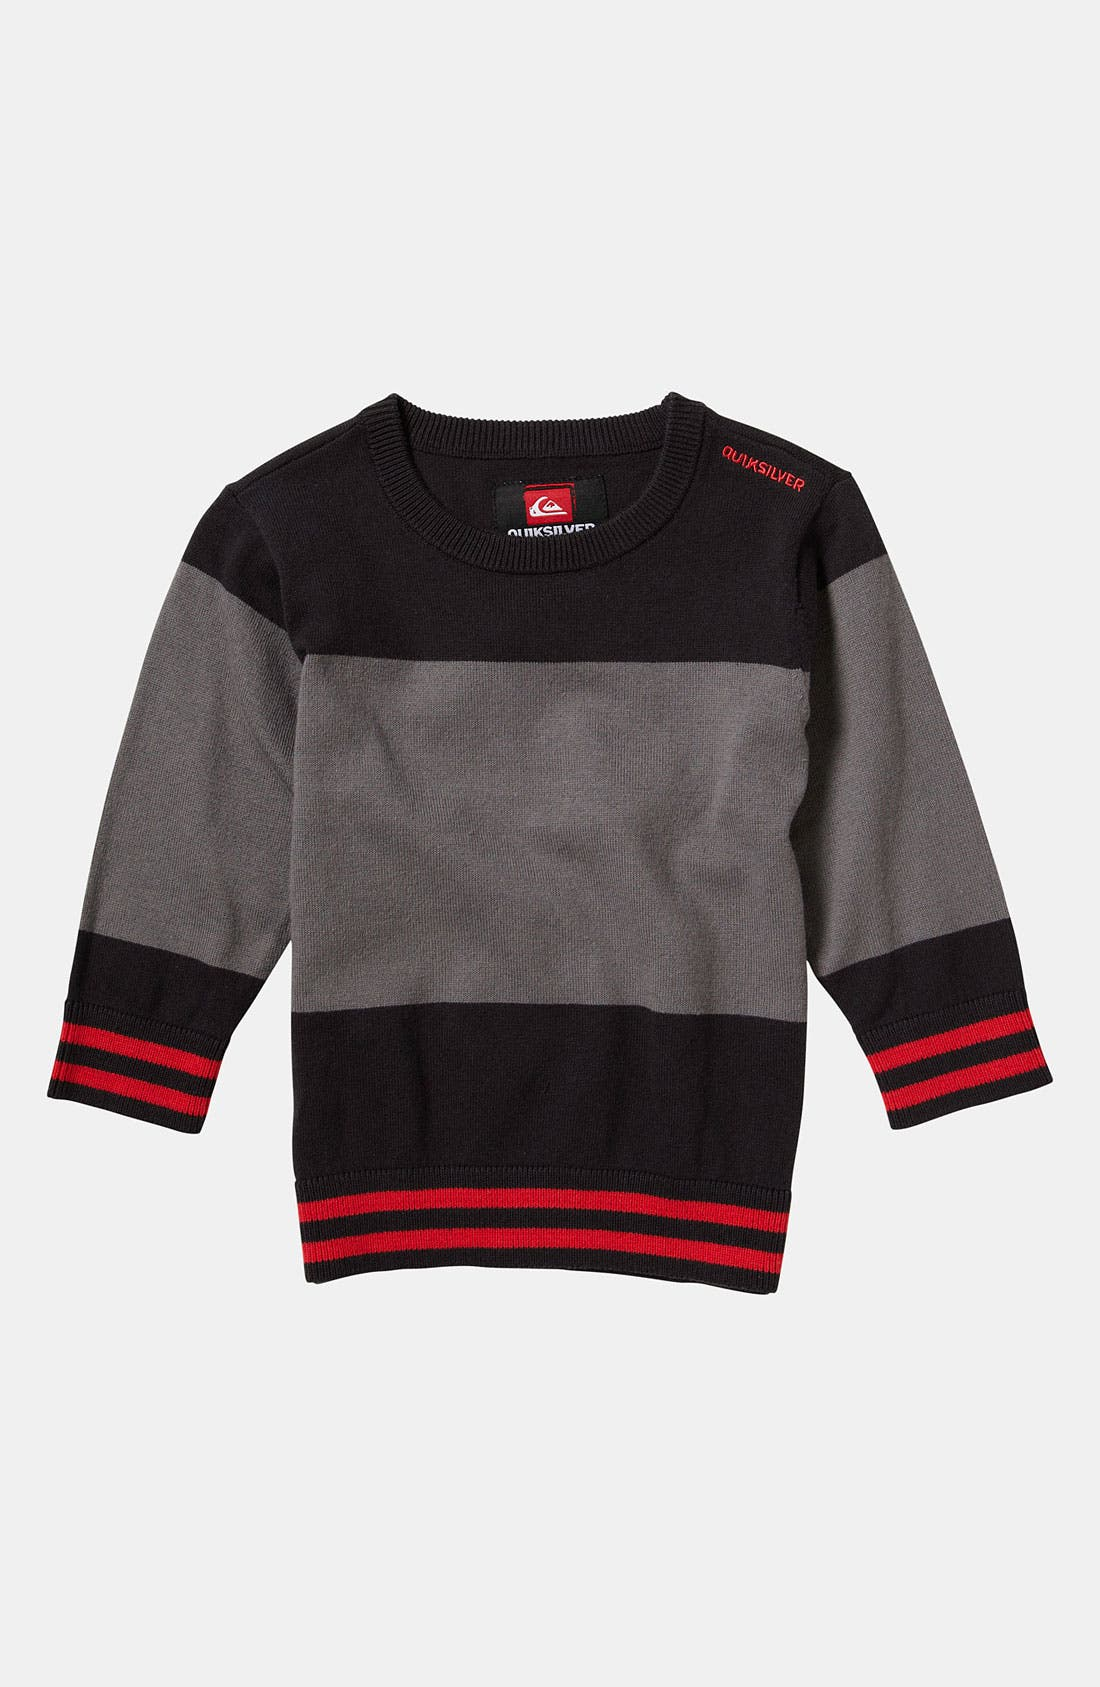 Main Image - Quiksilver 'Wild Card' Sweater (Toddler)